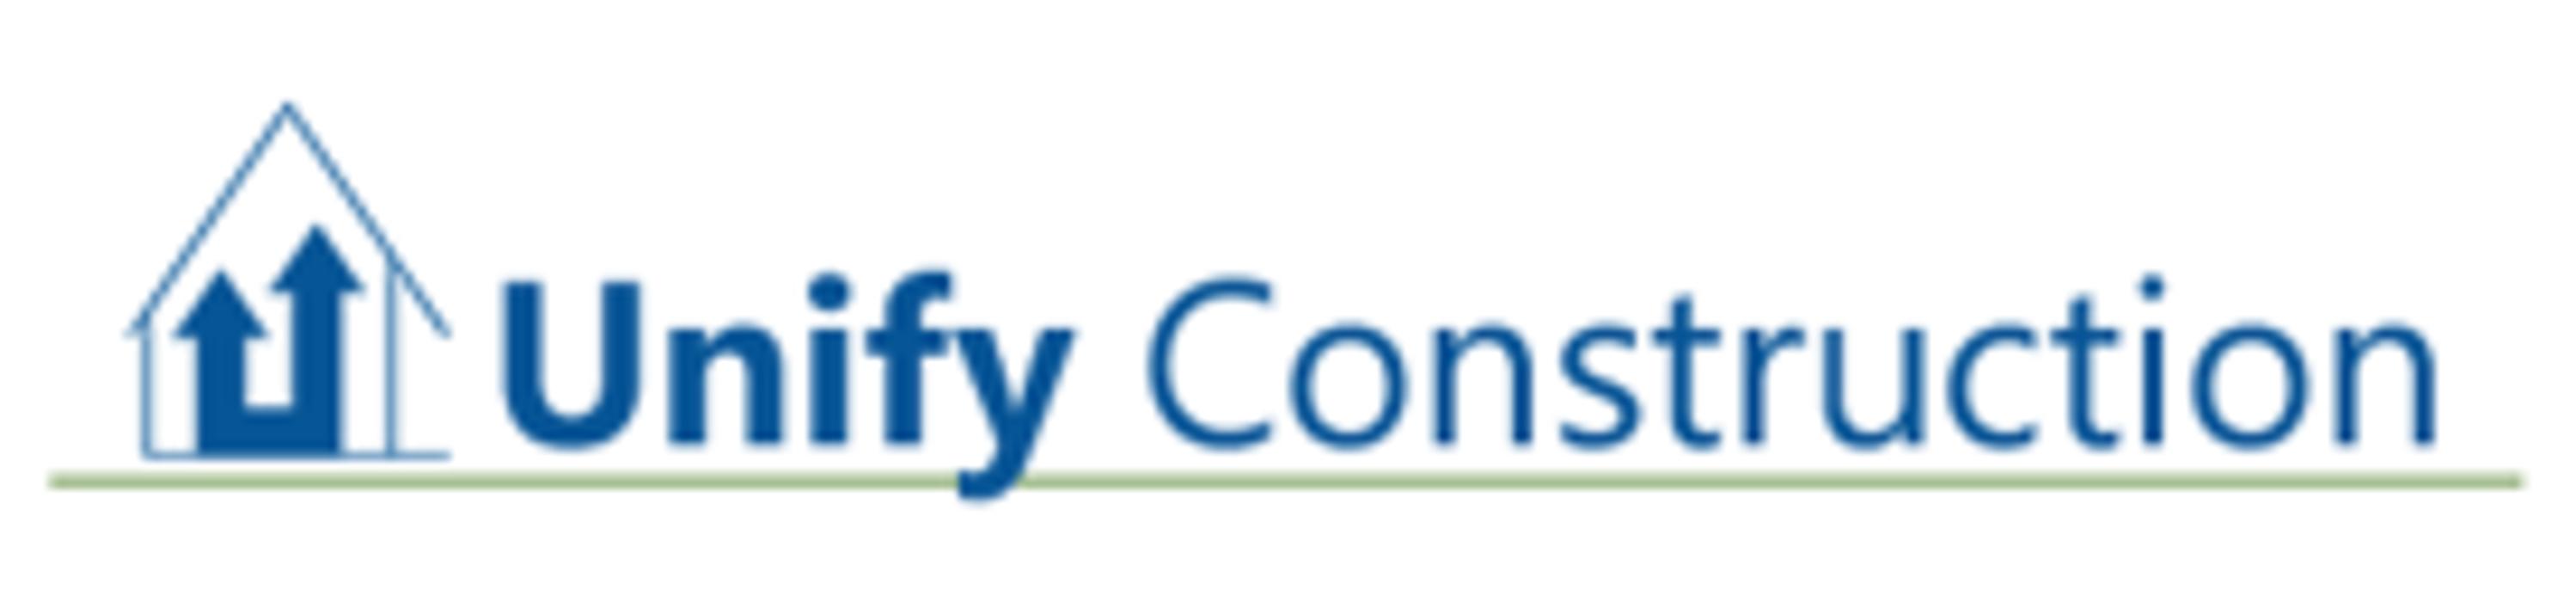 Unify Construction - Gastonia, NC